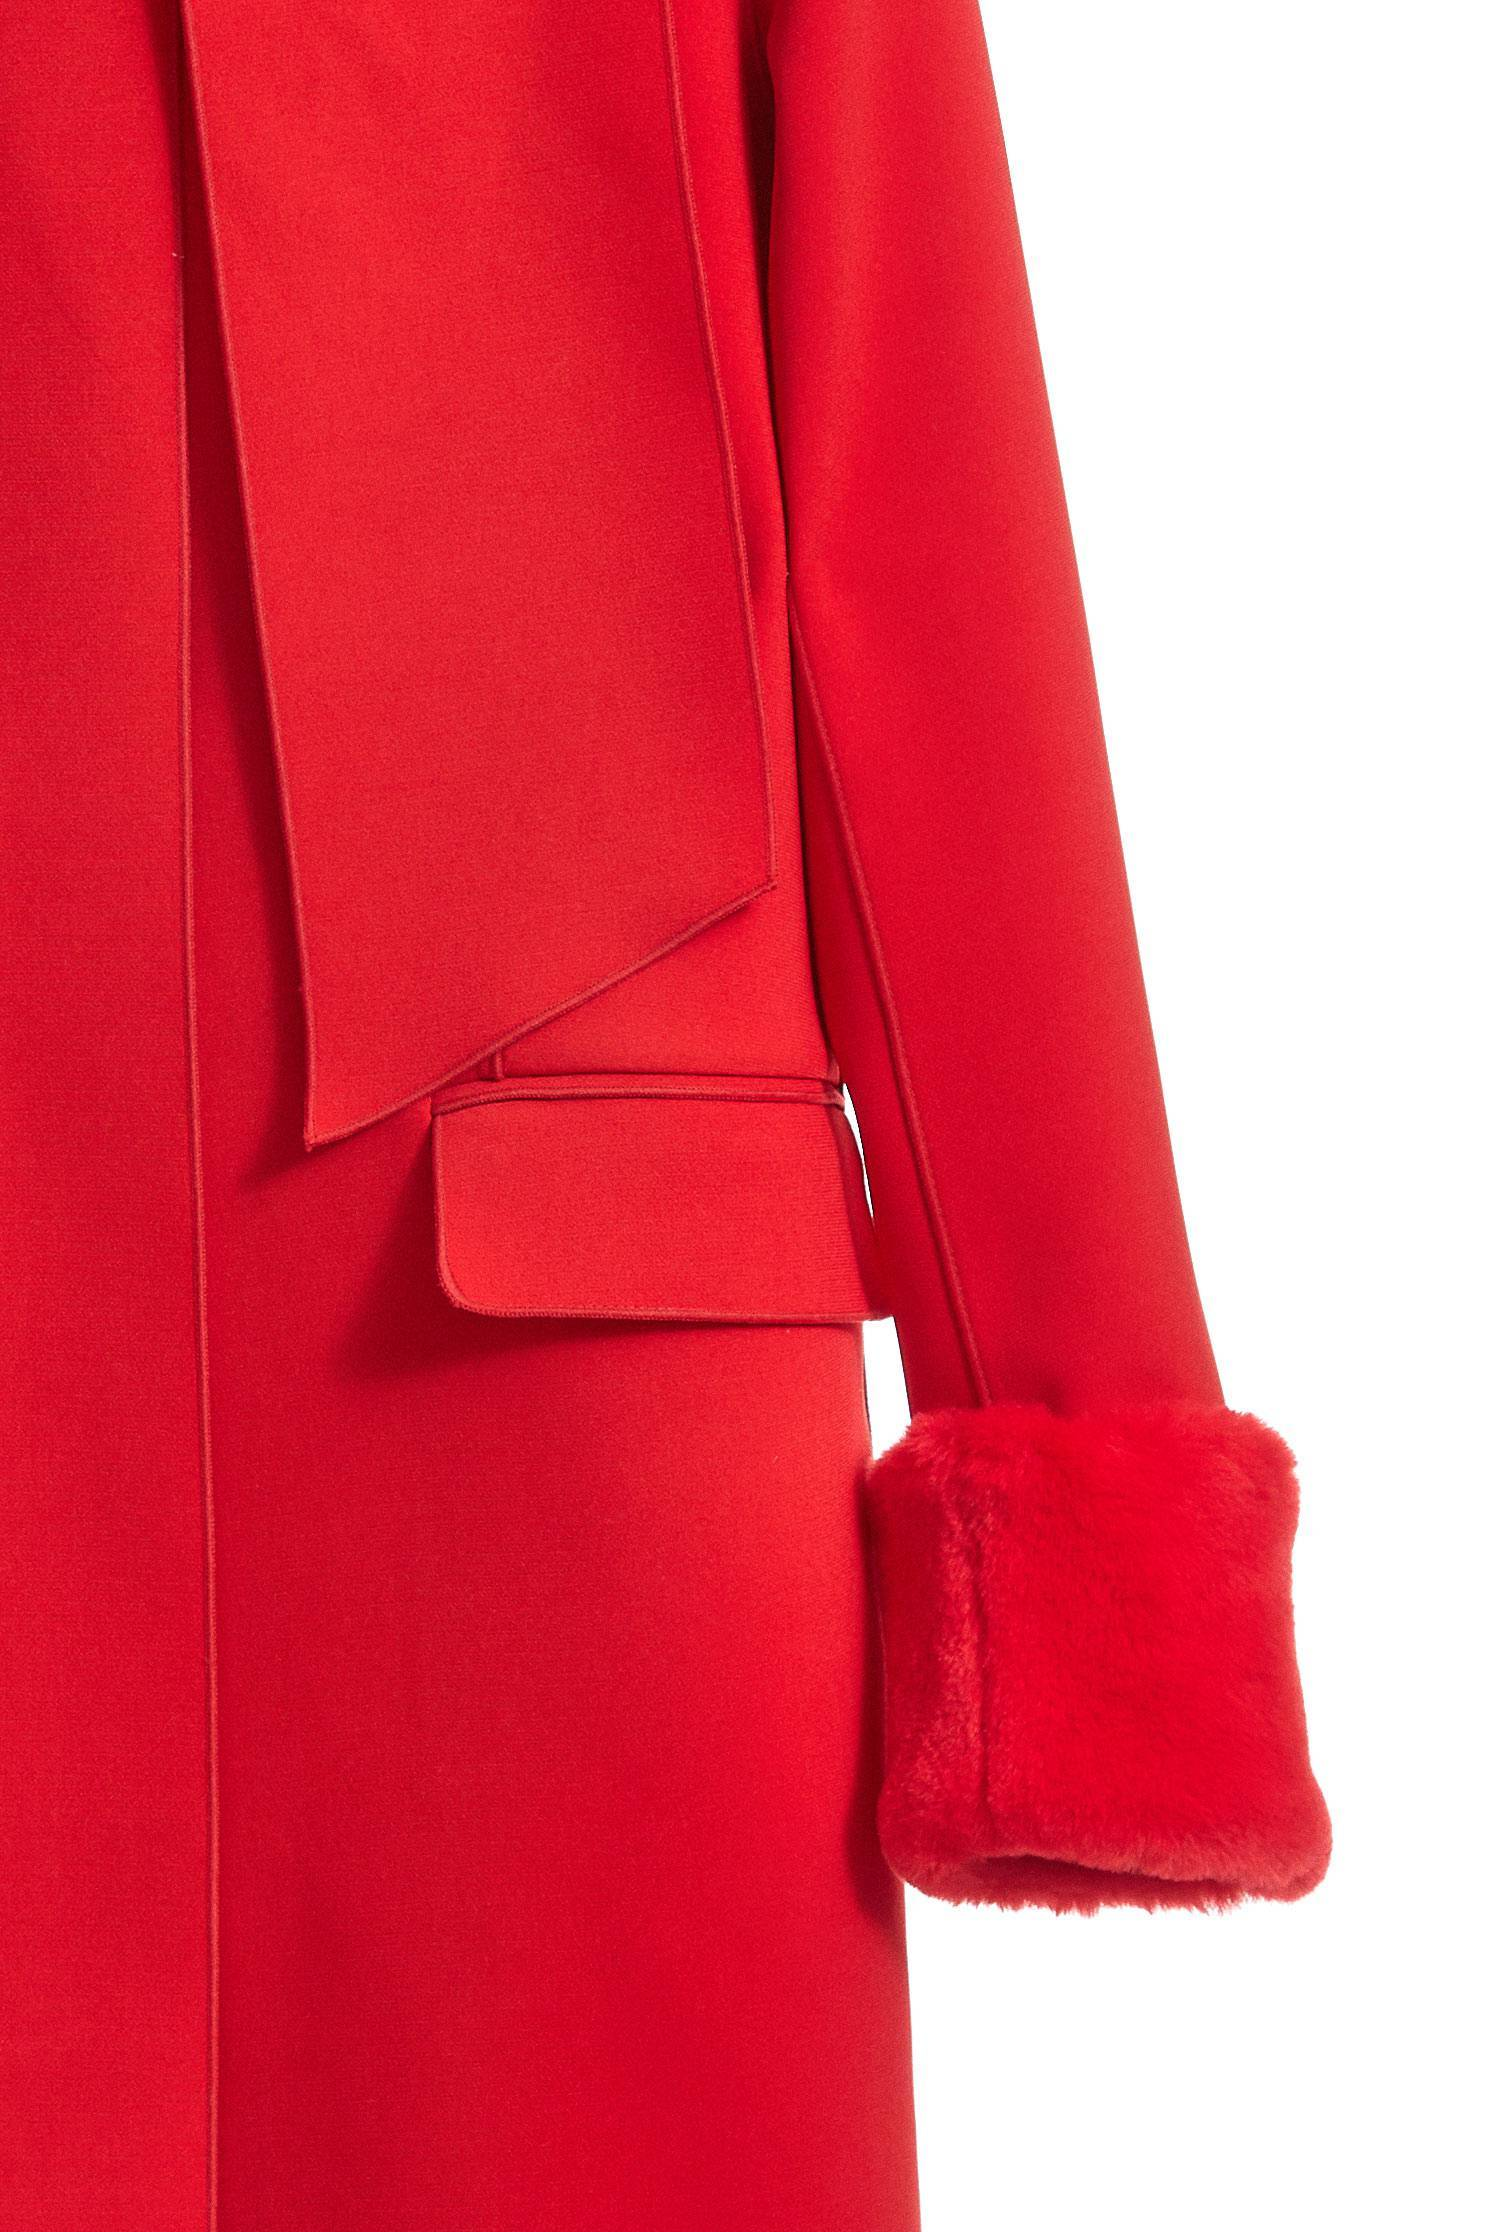 spicy ladies popular pairy coat,outerwear,longcoat,longcoat,longsleeveouterwear